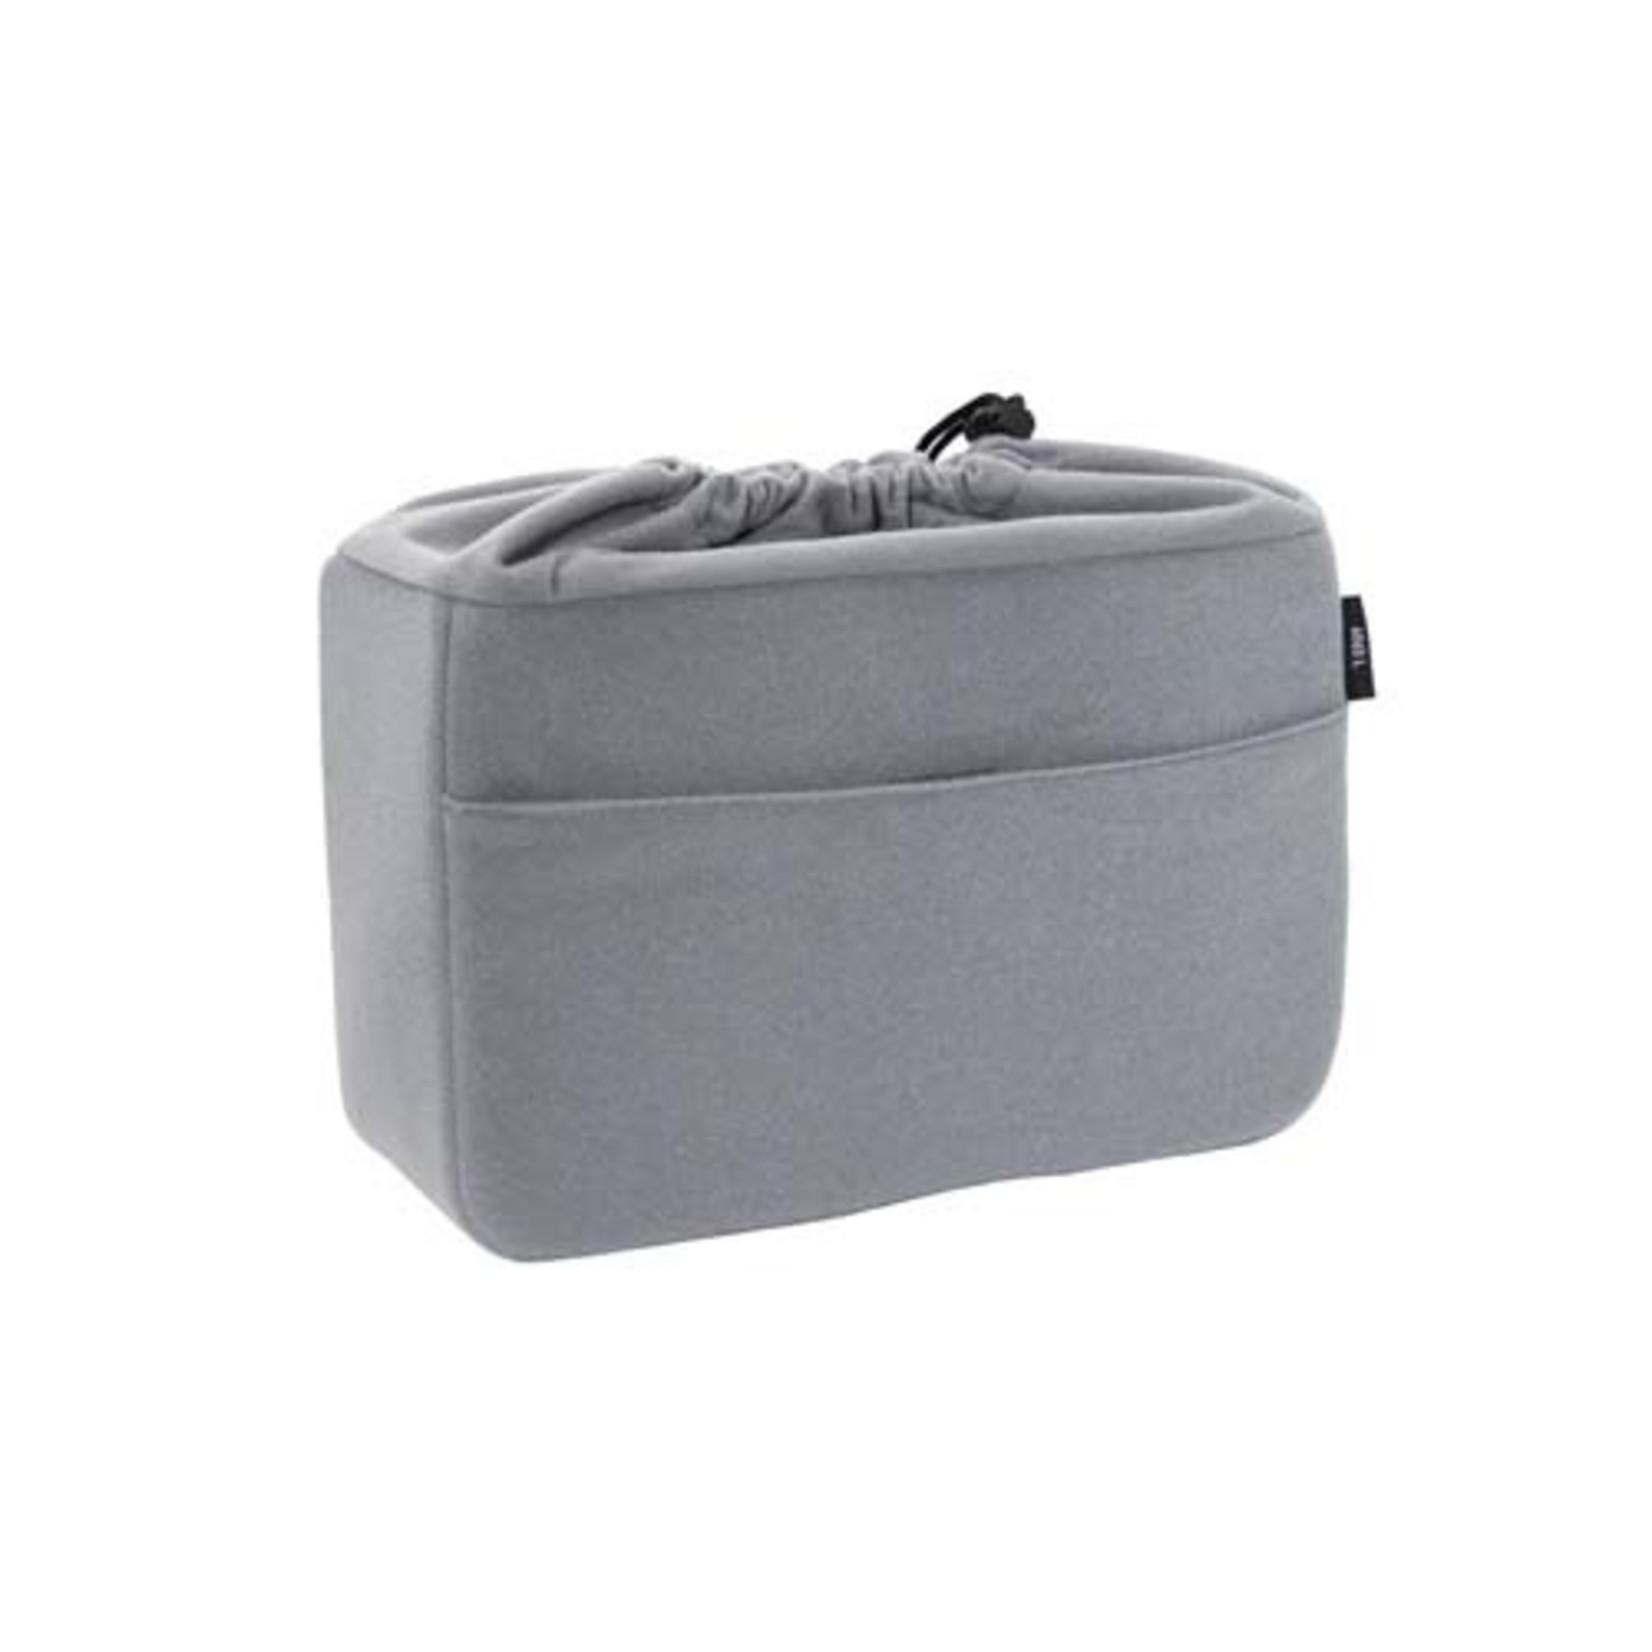 ProMaster Bag Insert - Large